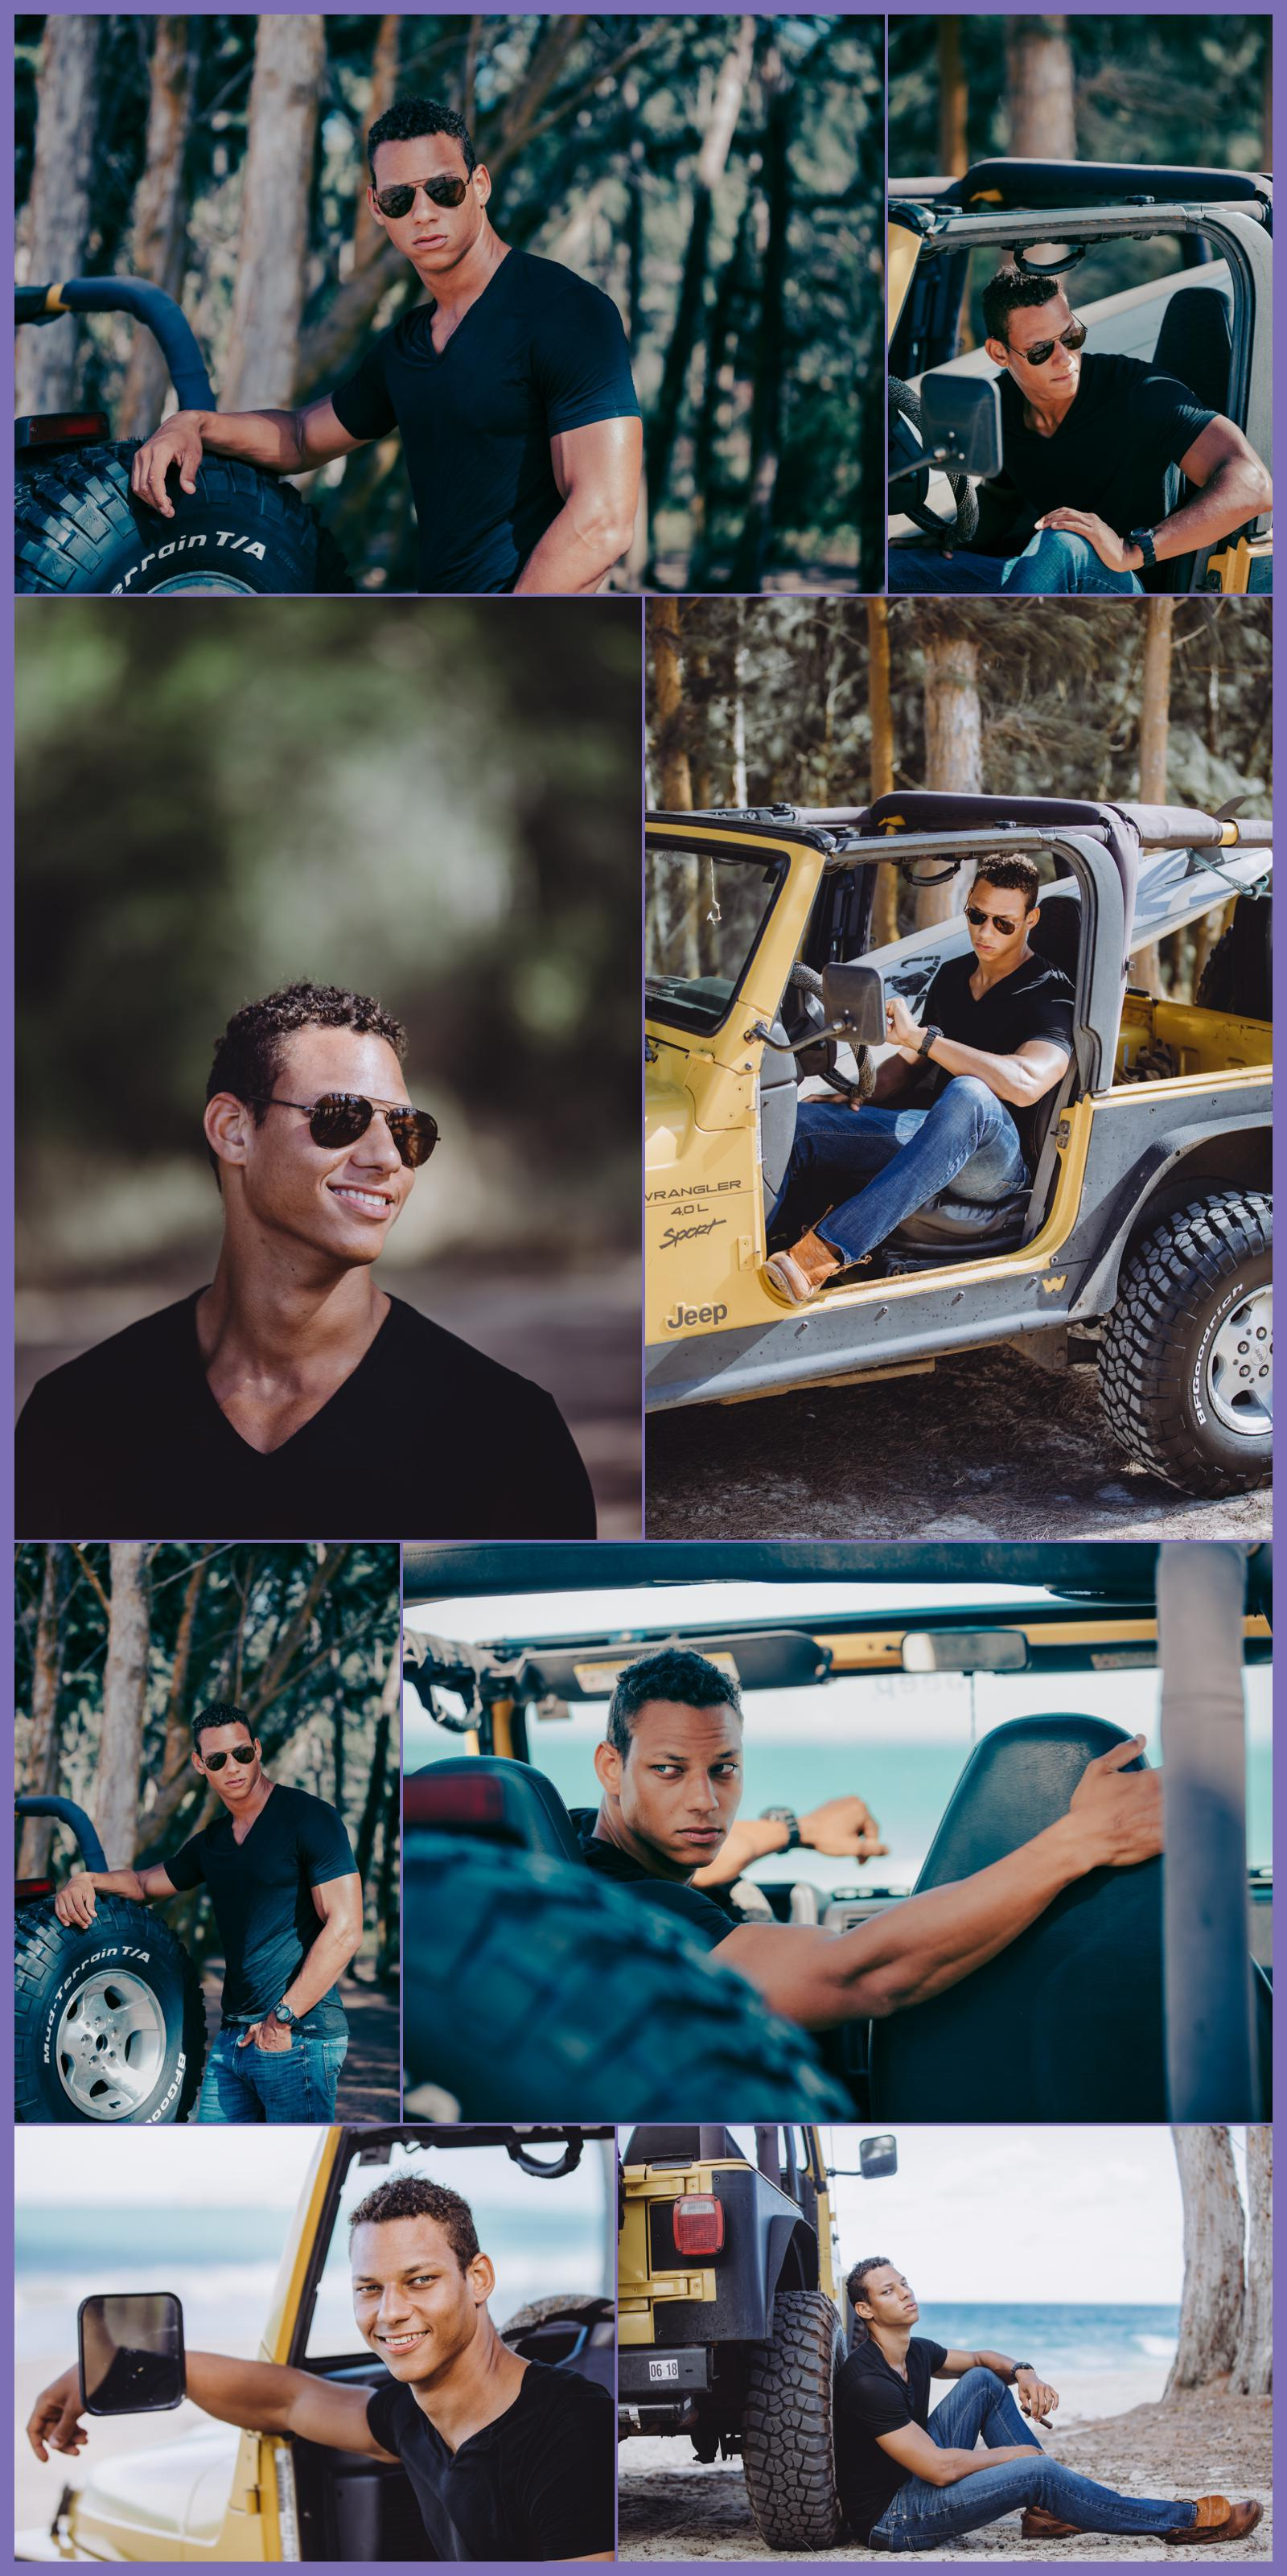 Hawaii Premier Modeling - Honolulu Modeling Agency - Ketino Photography - Oahu Glamour Photographer